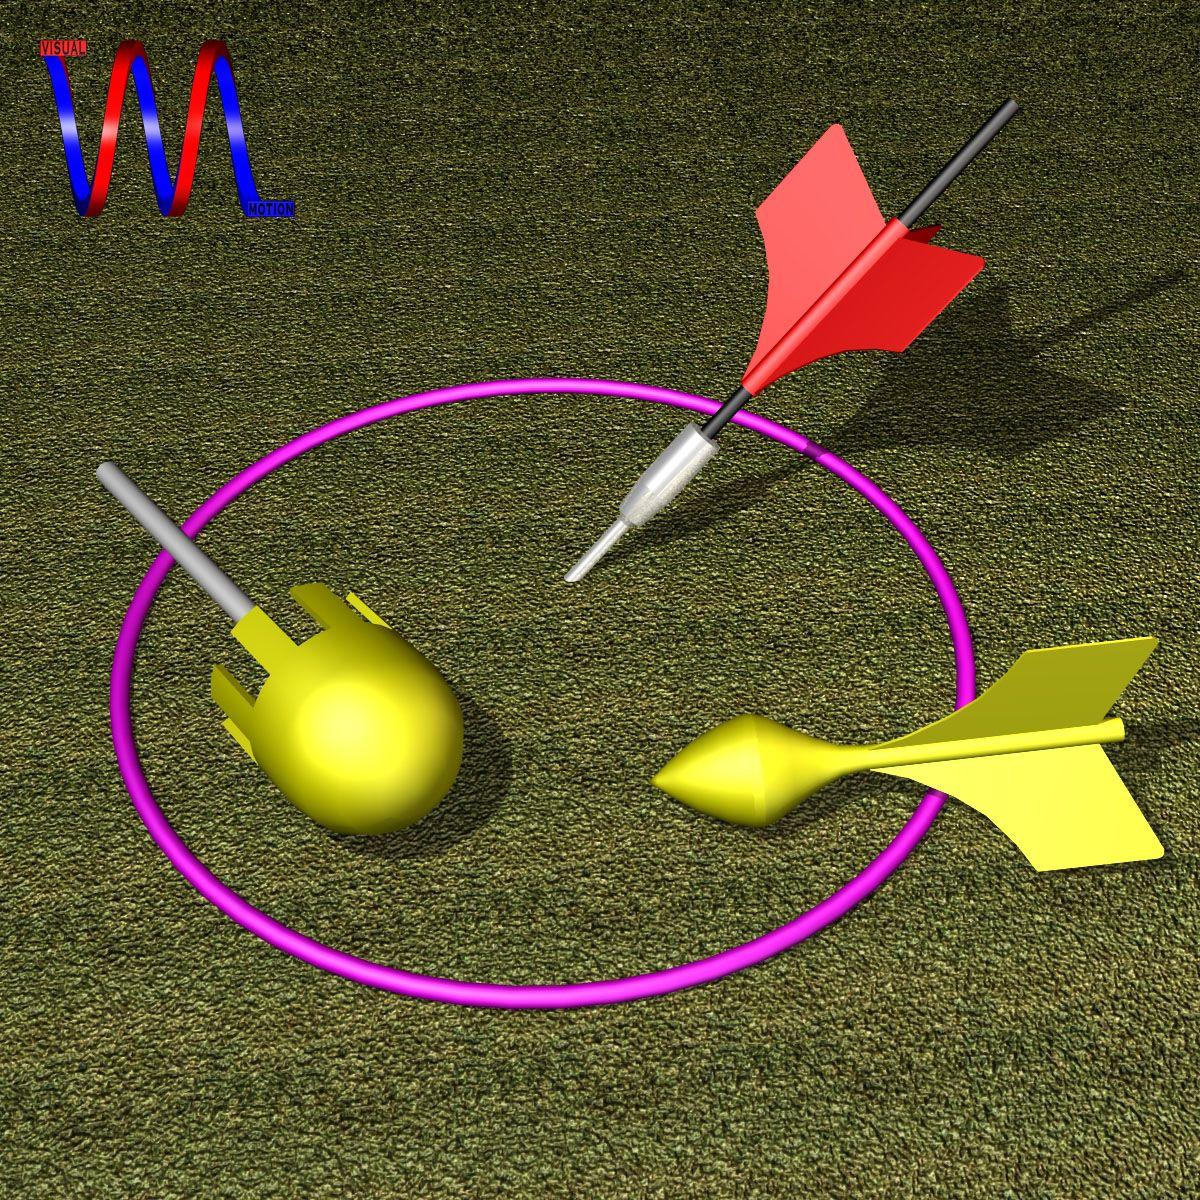 Lawn dart set d model latest d models pinterest model dart